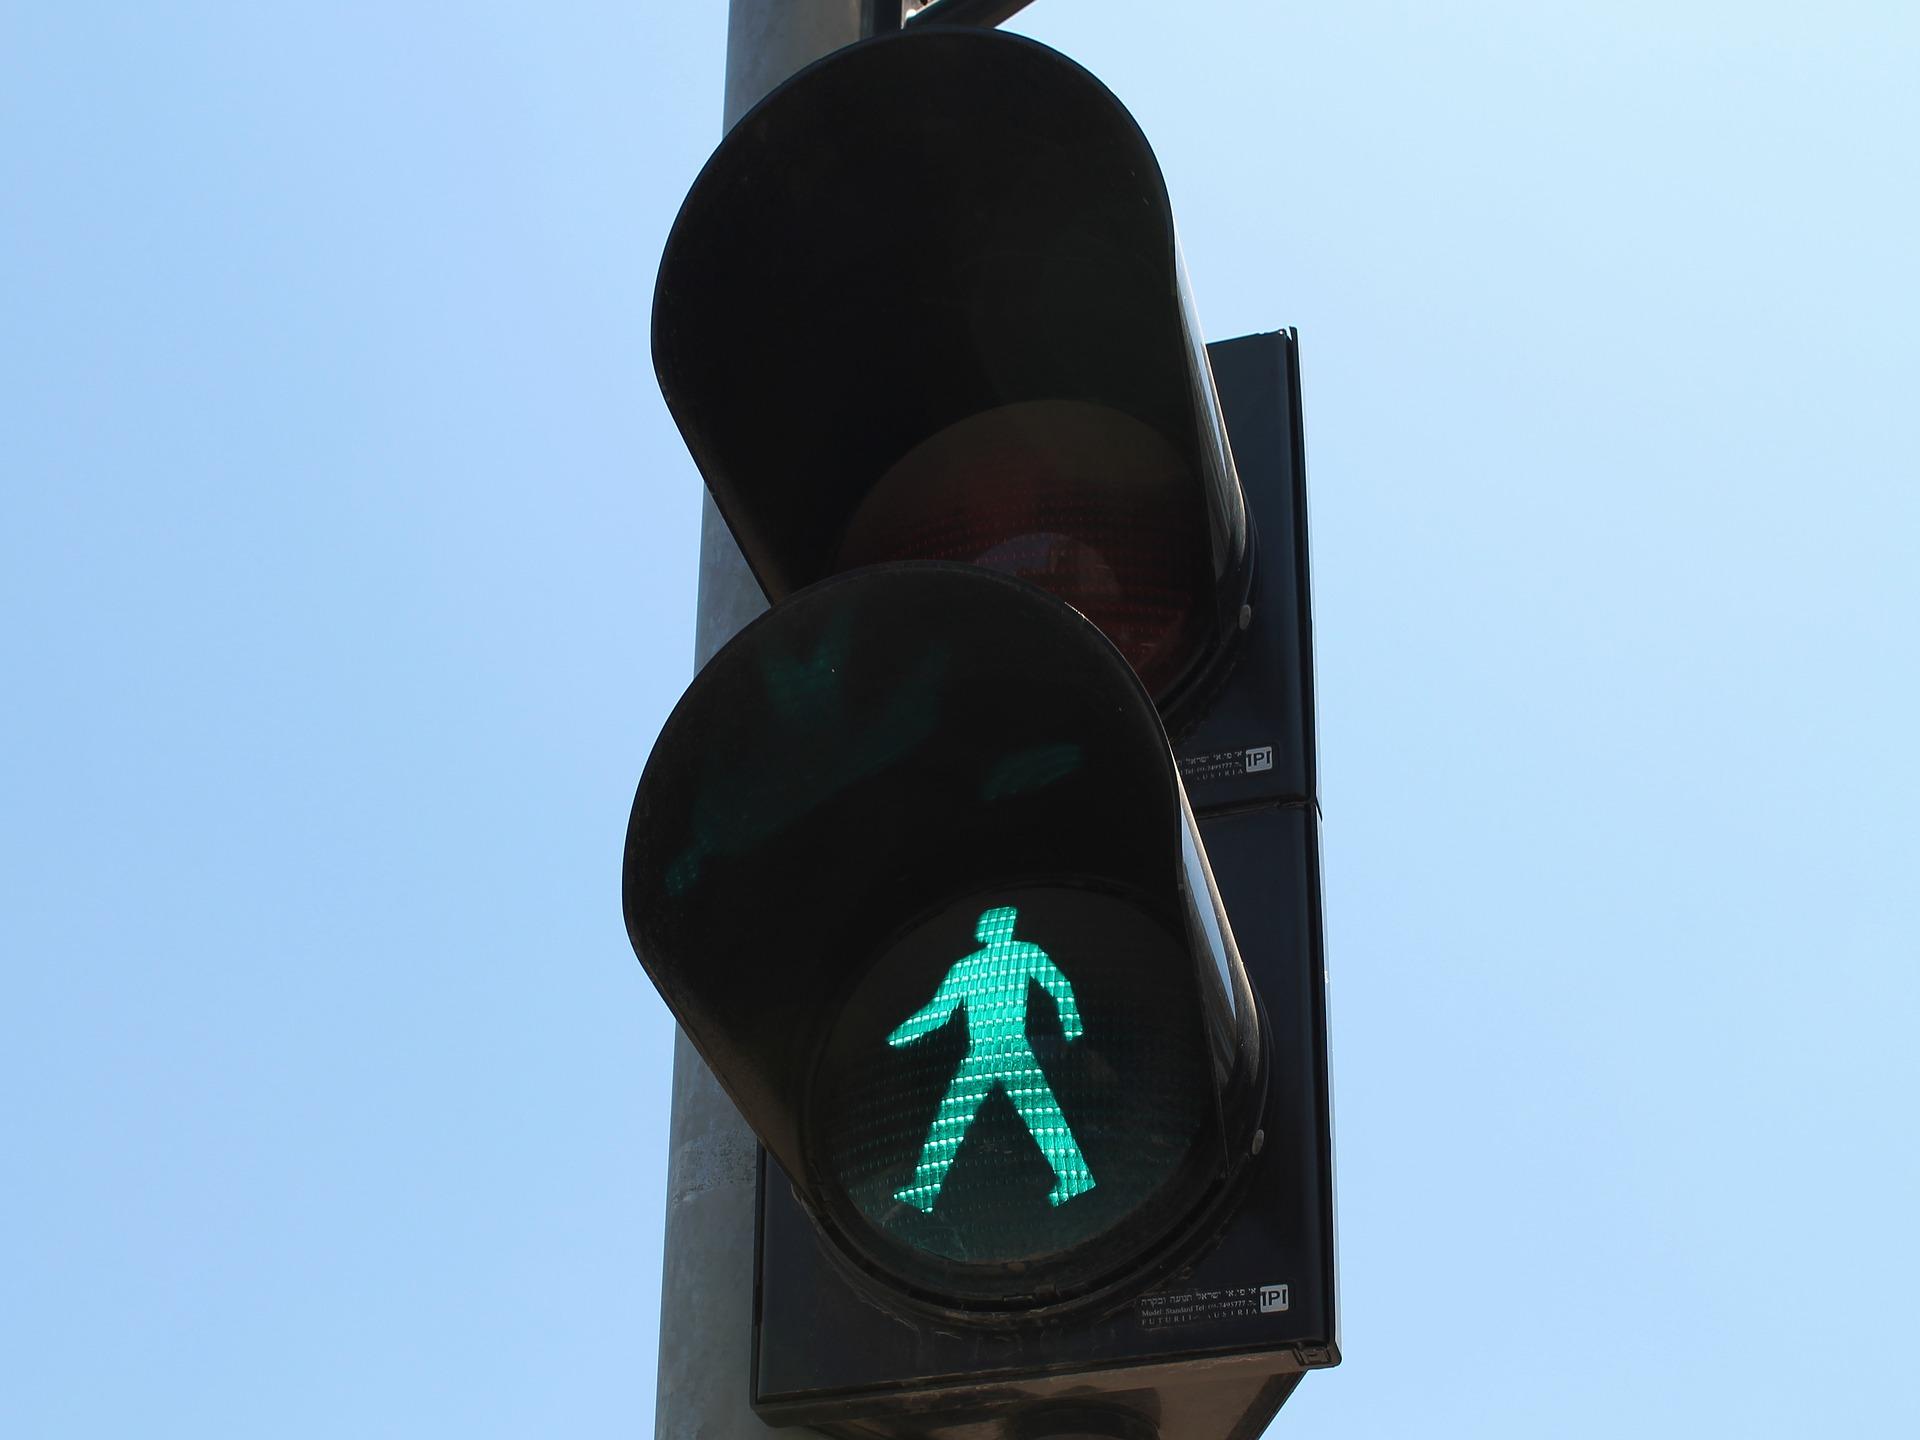 светофор пешеход piksabaj